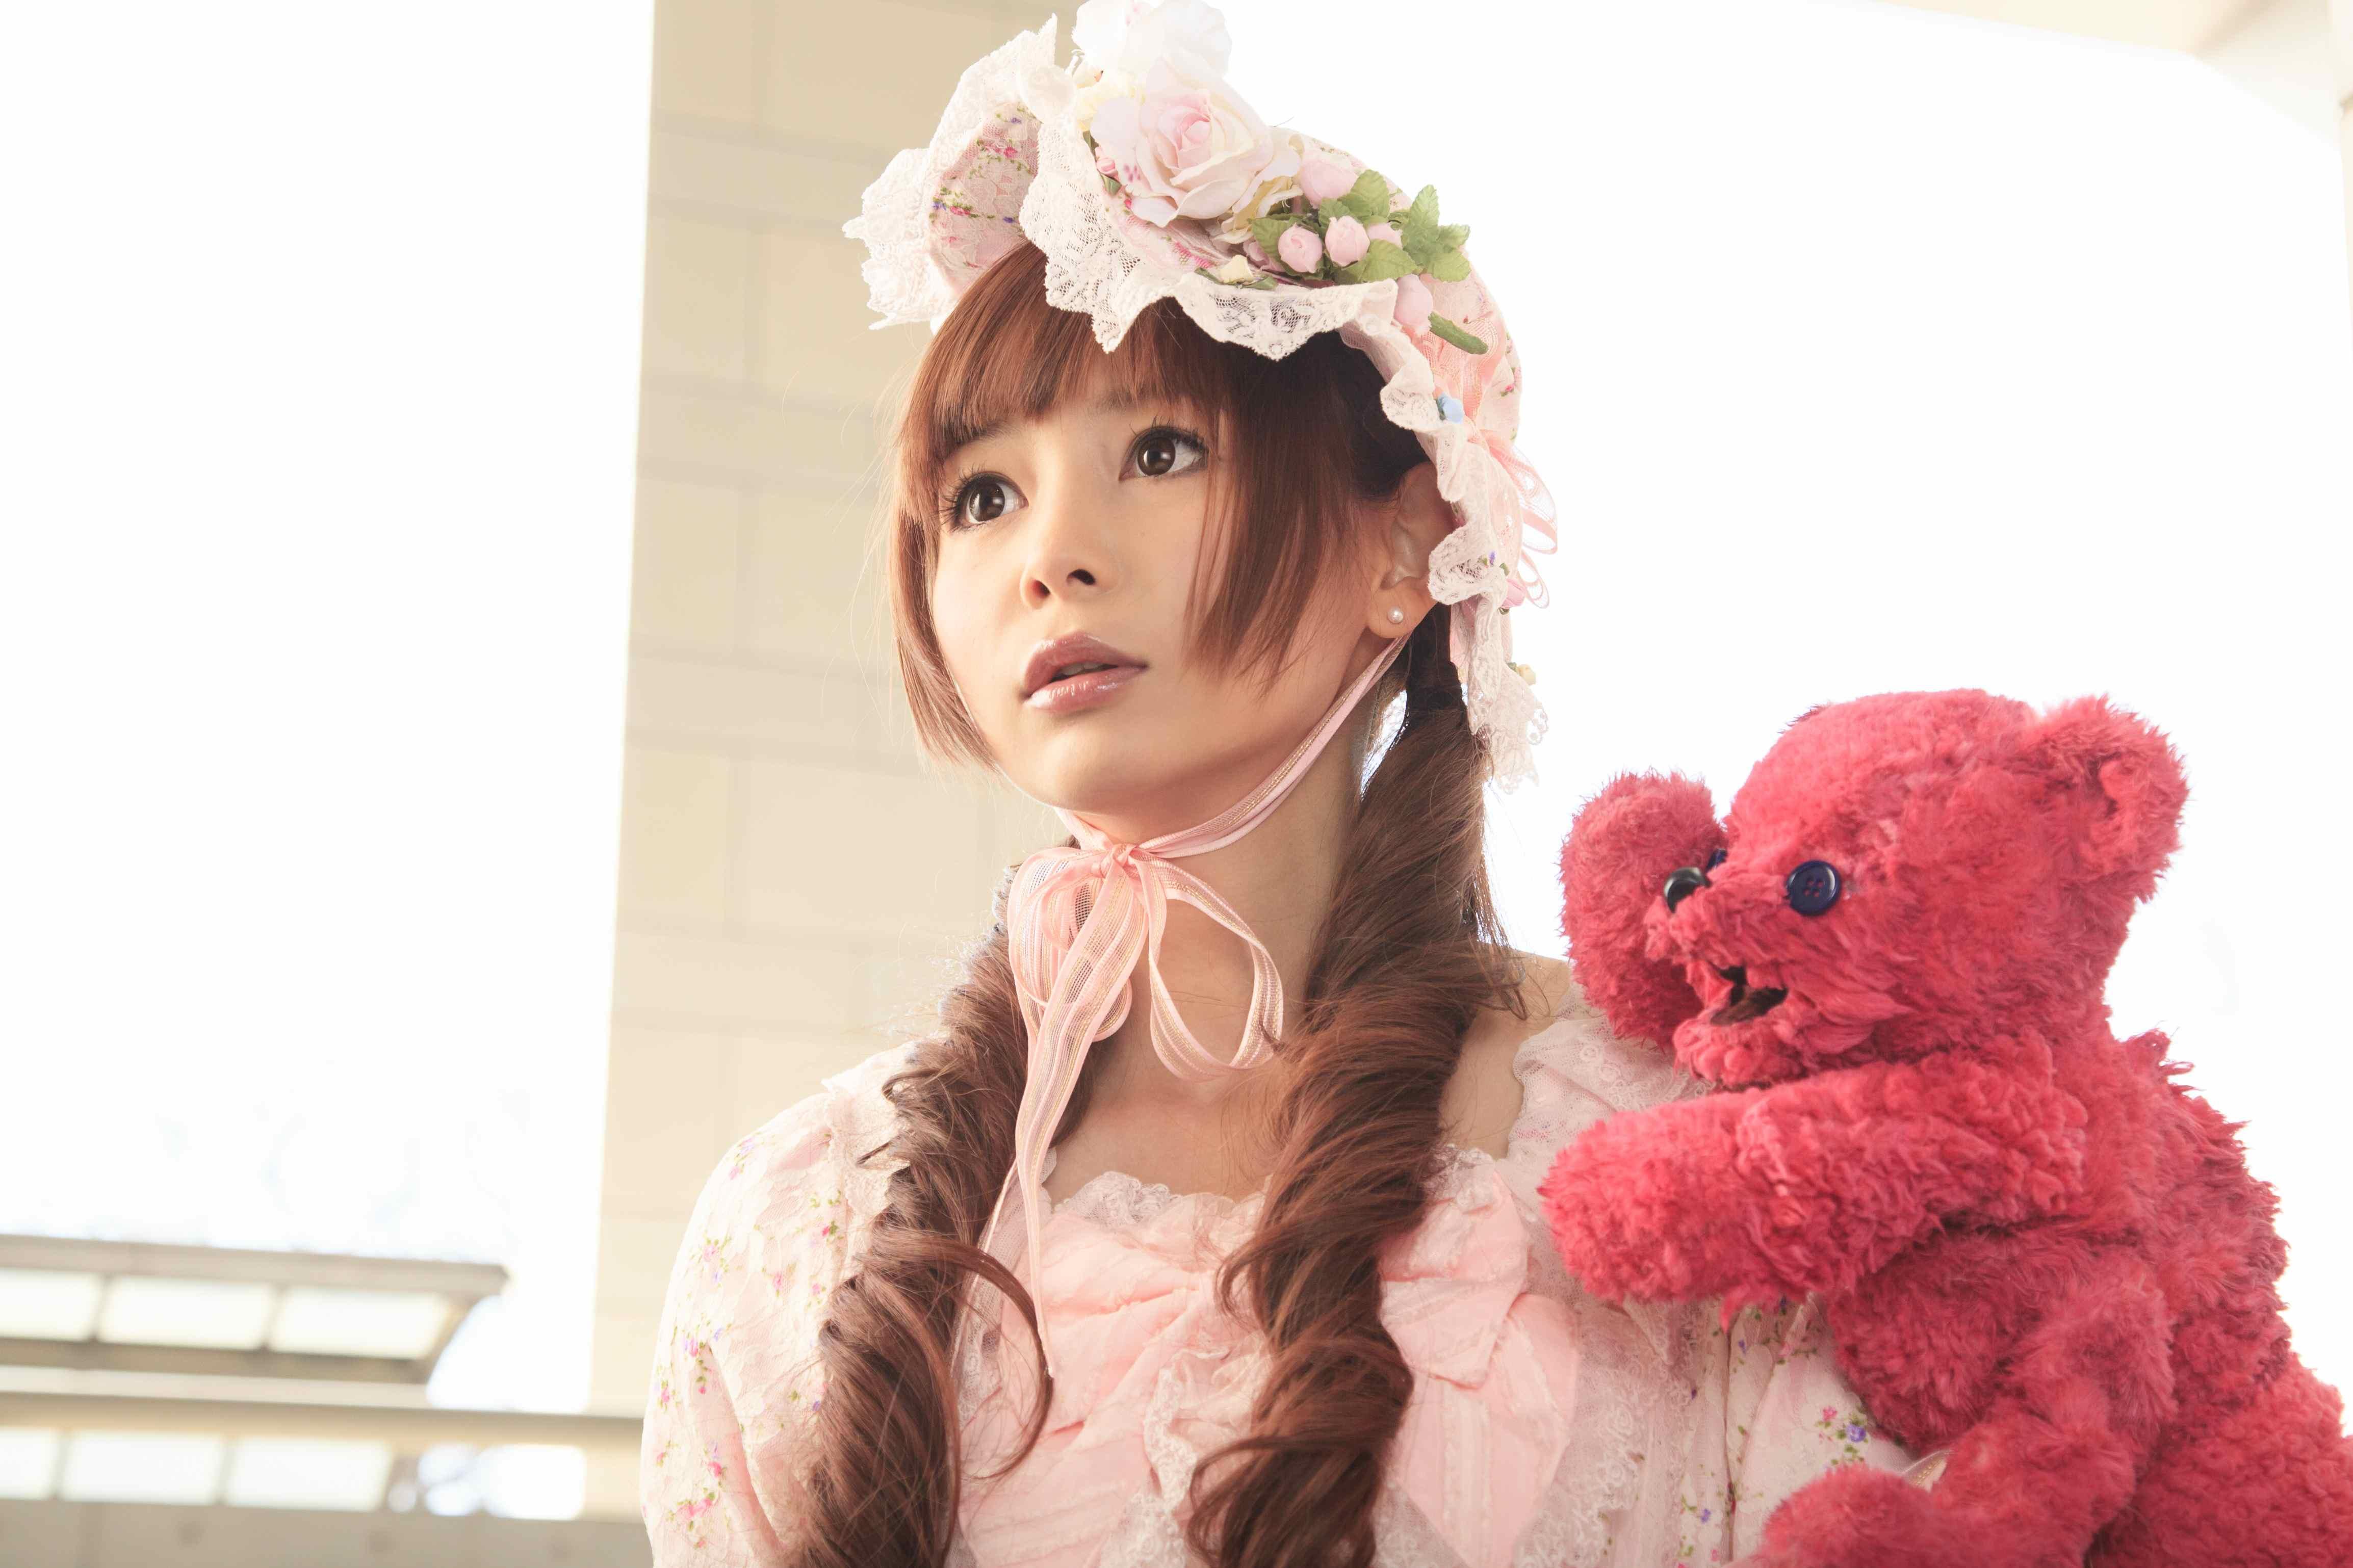 Gothic Lolita Battle Bear: Shôko Nakagawa e il suo orsetto